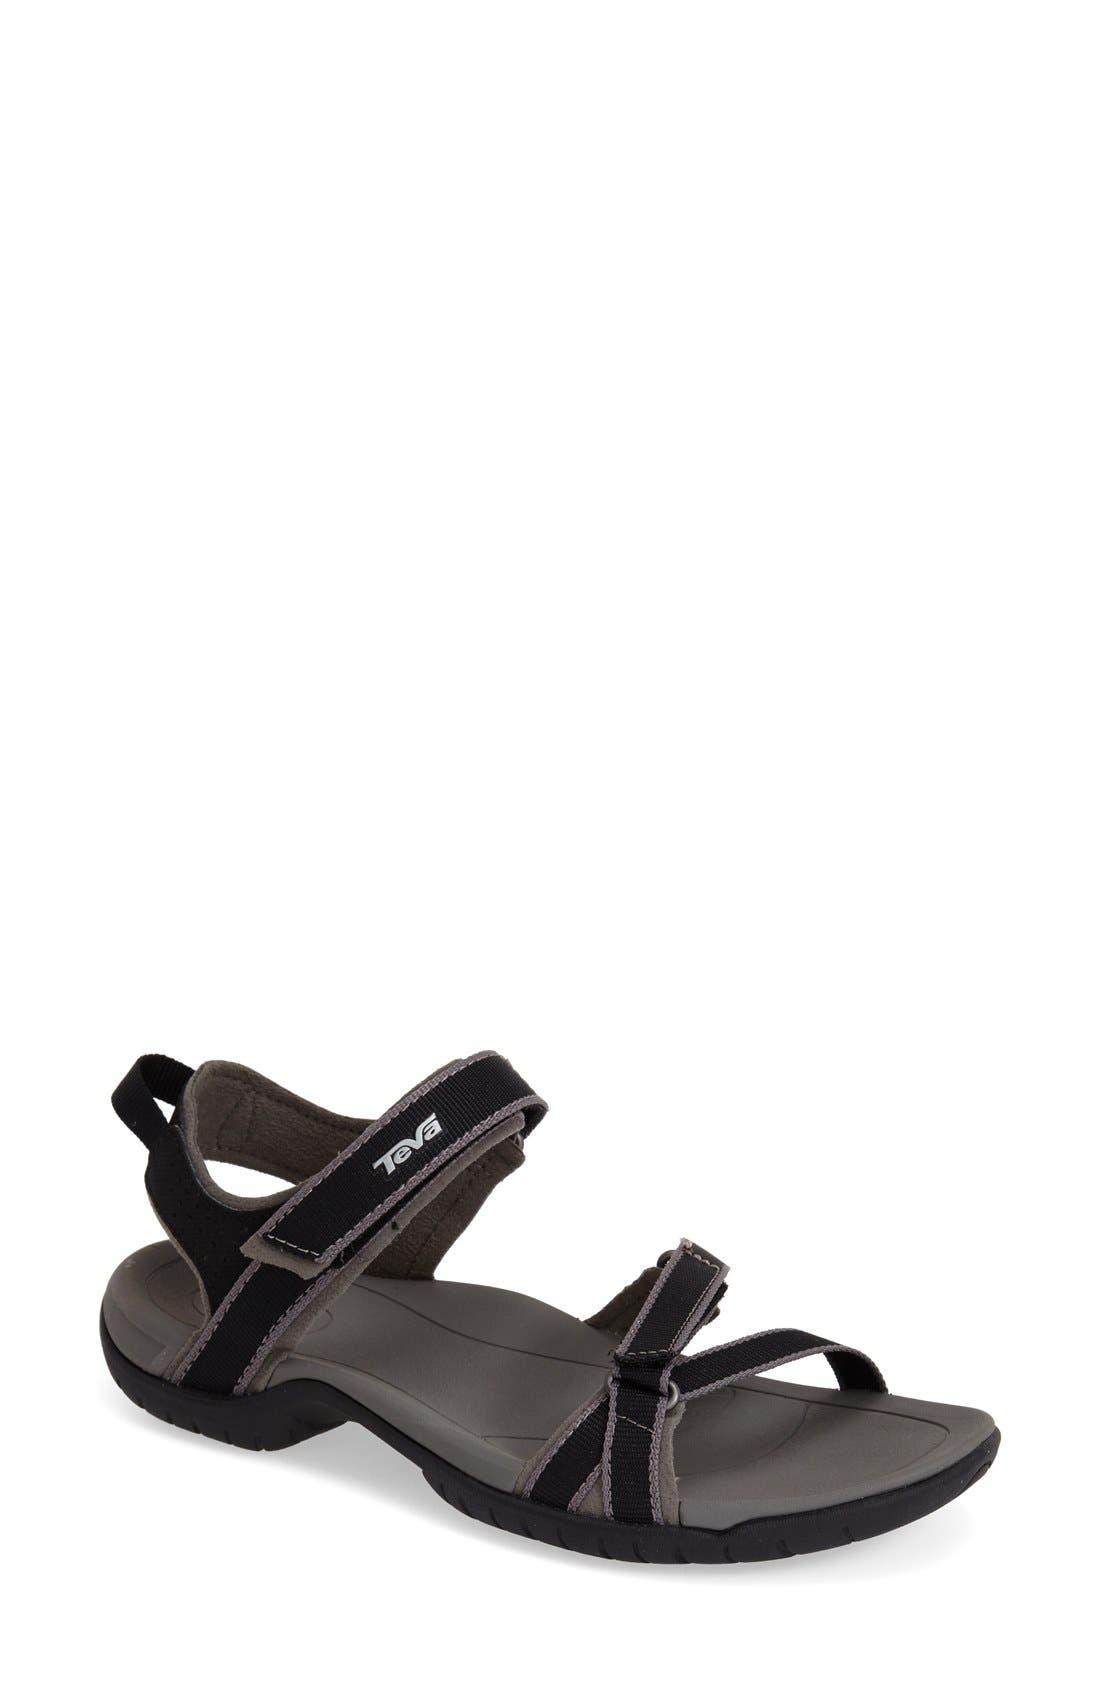 'Verra' Sandal,                         Main,                         color, Black/ Grey